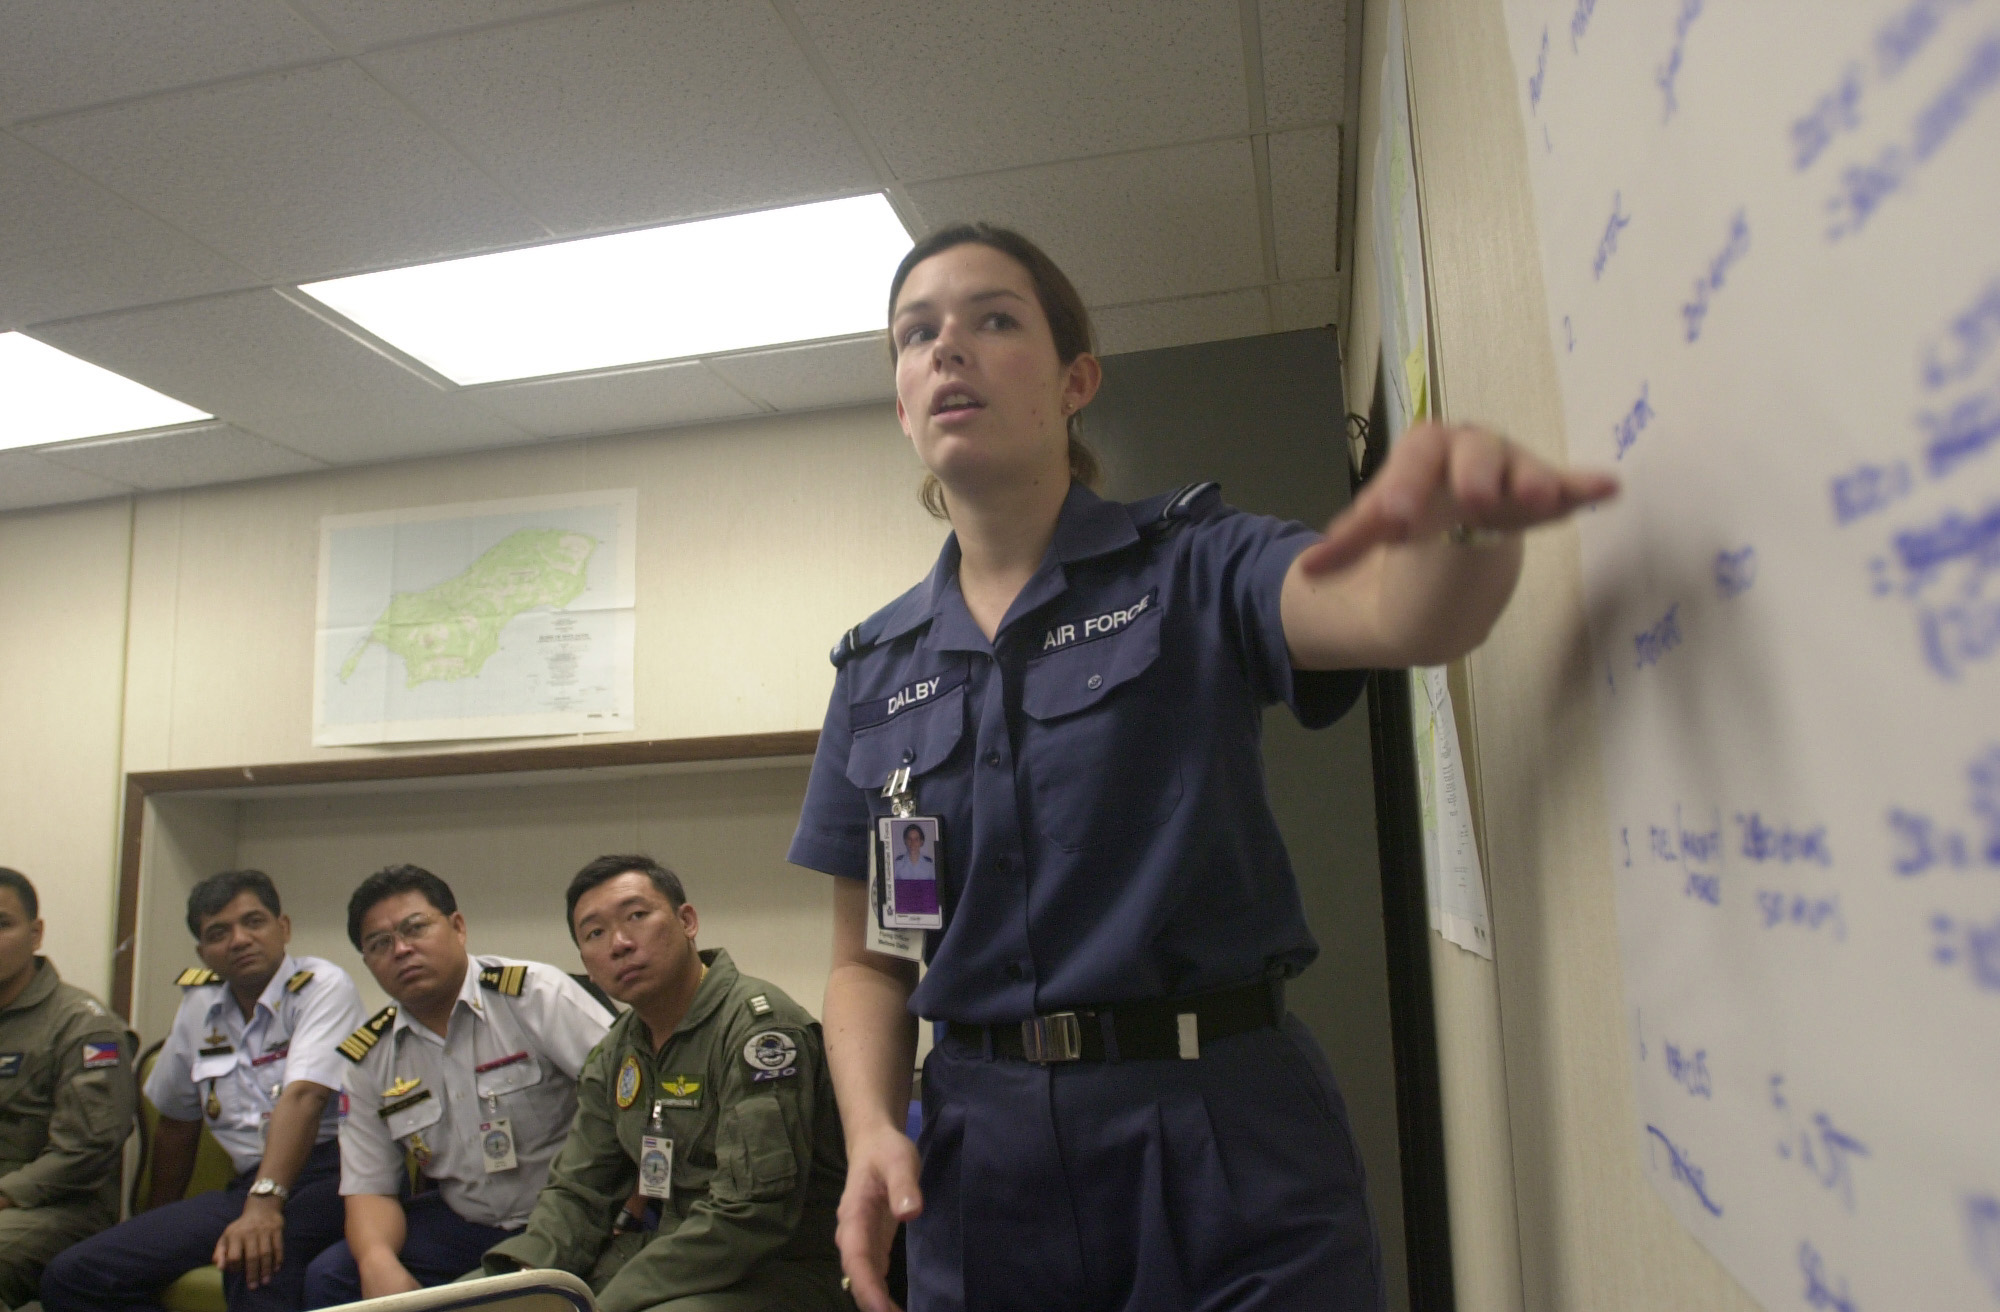 fileflag officer melissa dalby 86 wg royal australian air force presents